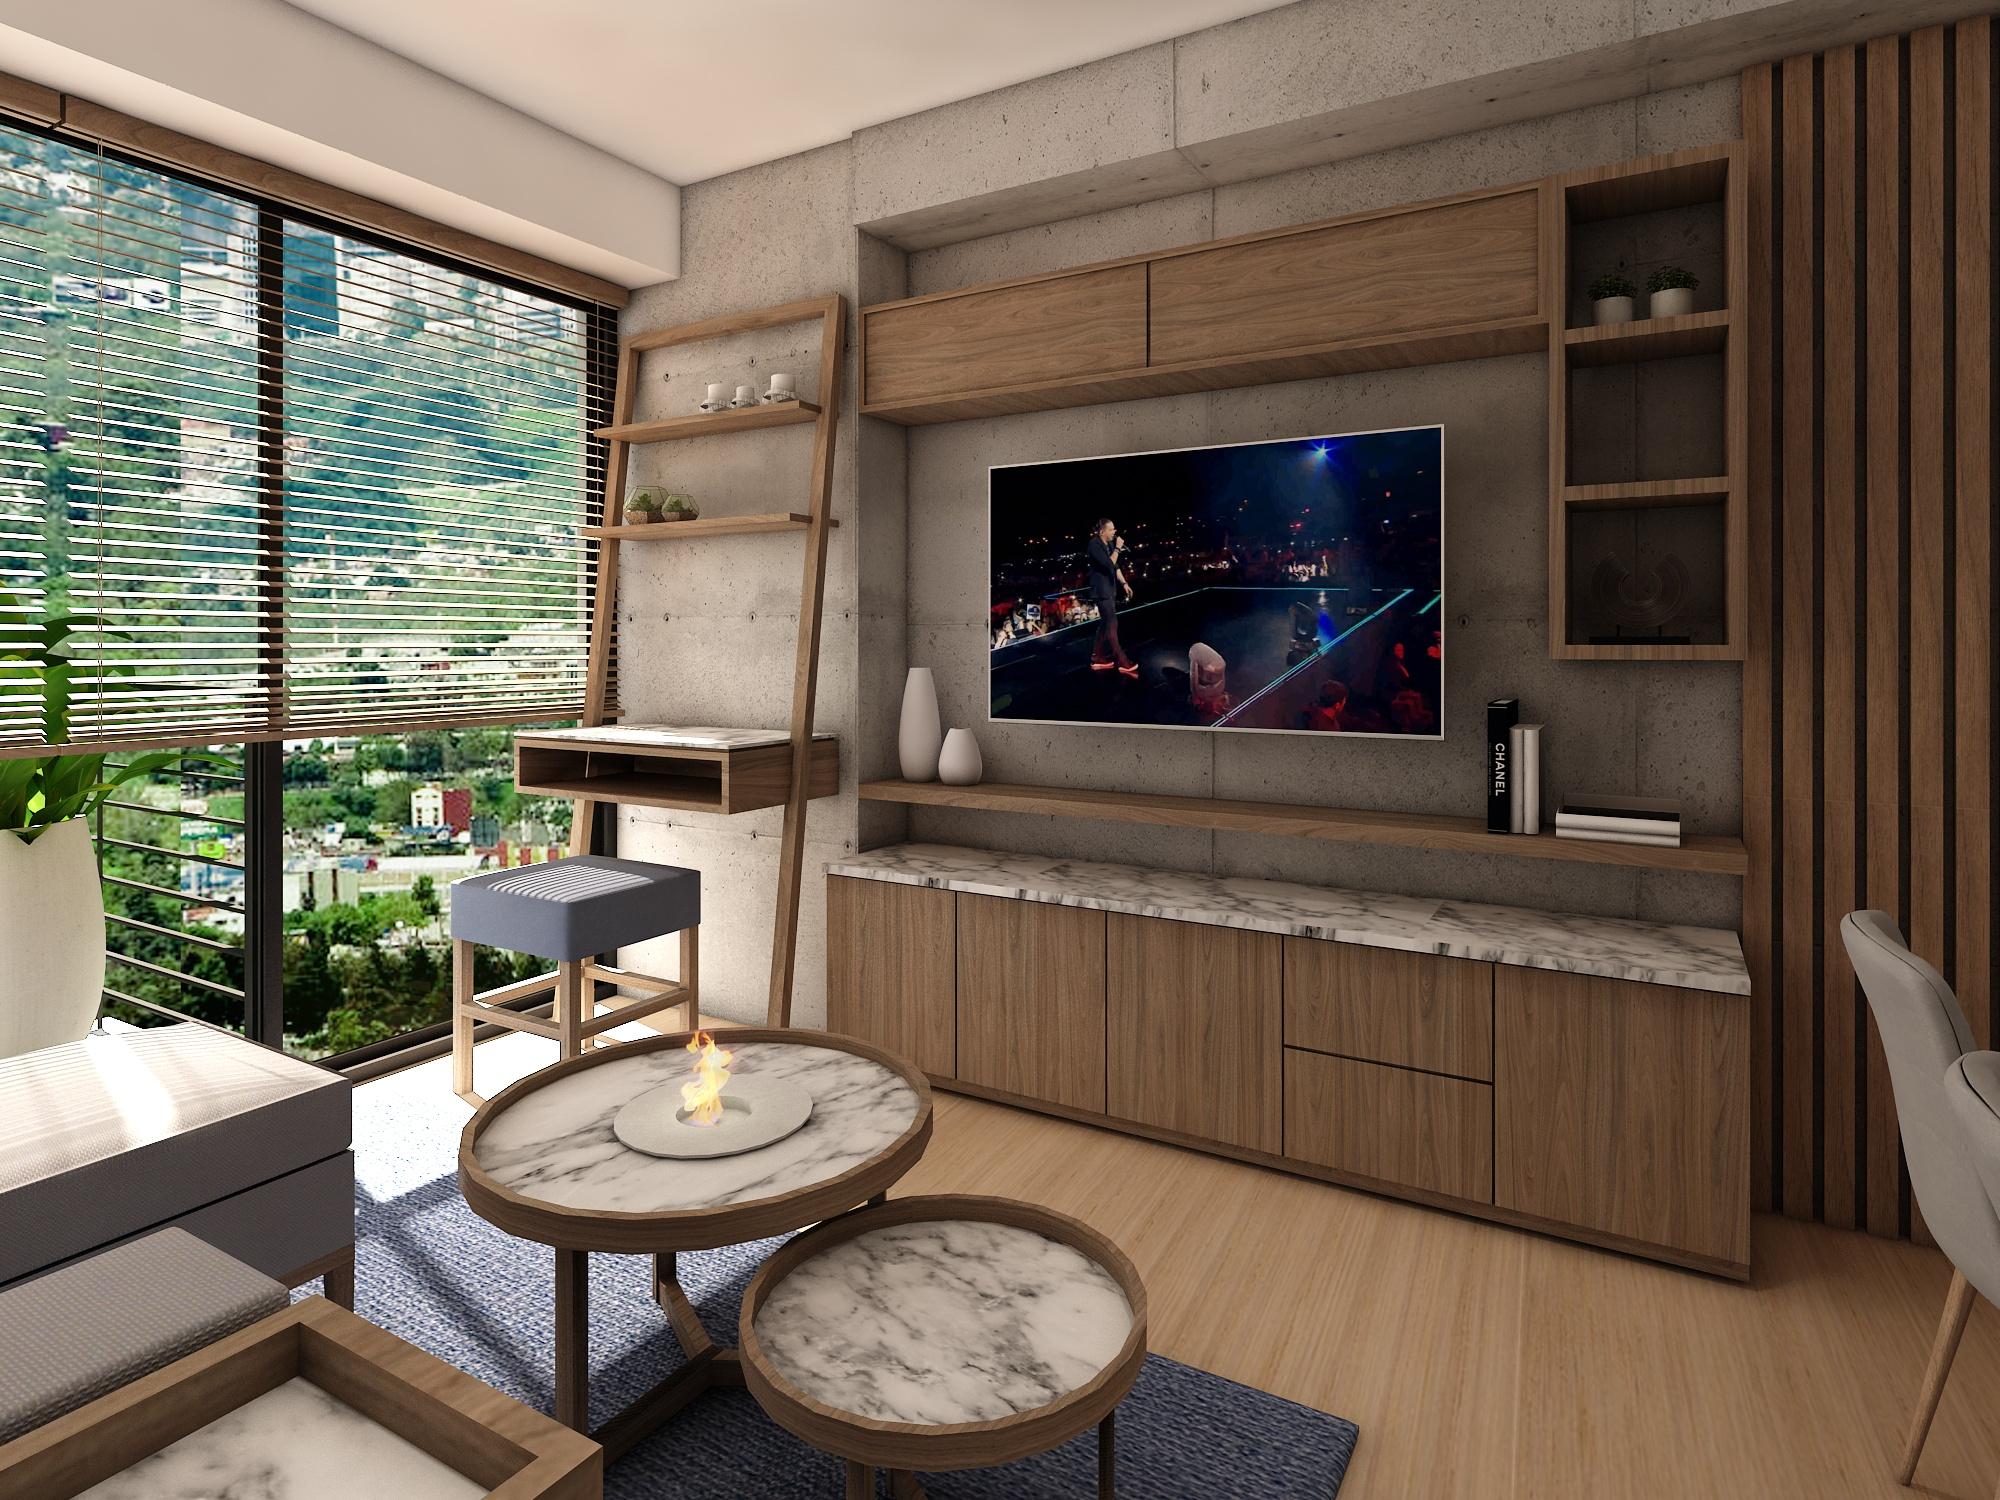 sala-muebledetv-diseñointeriores